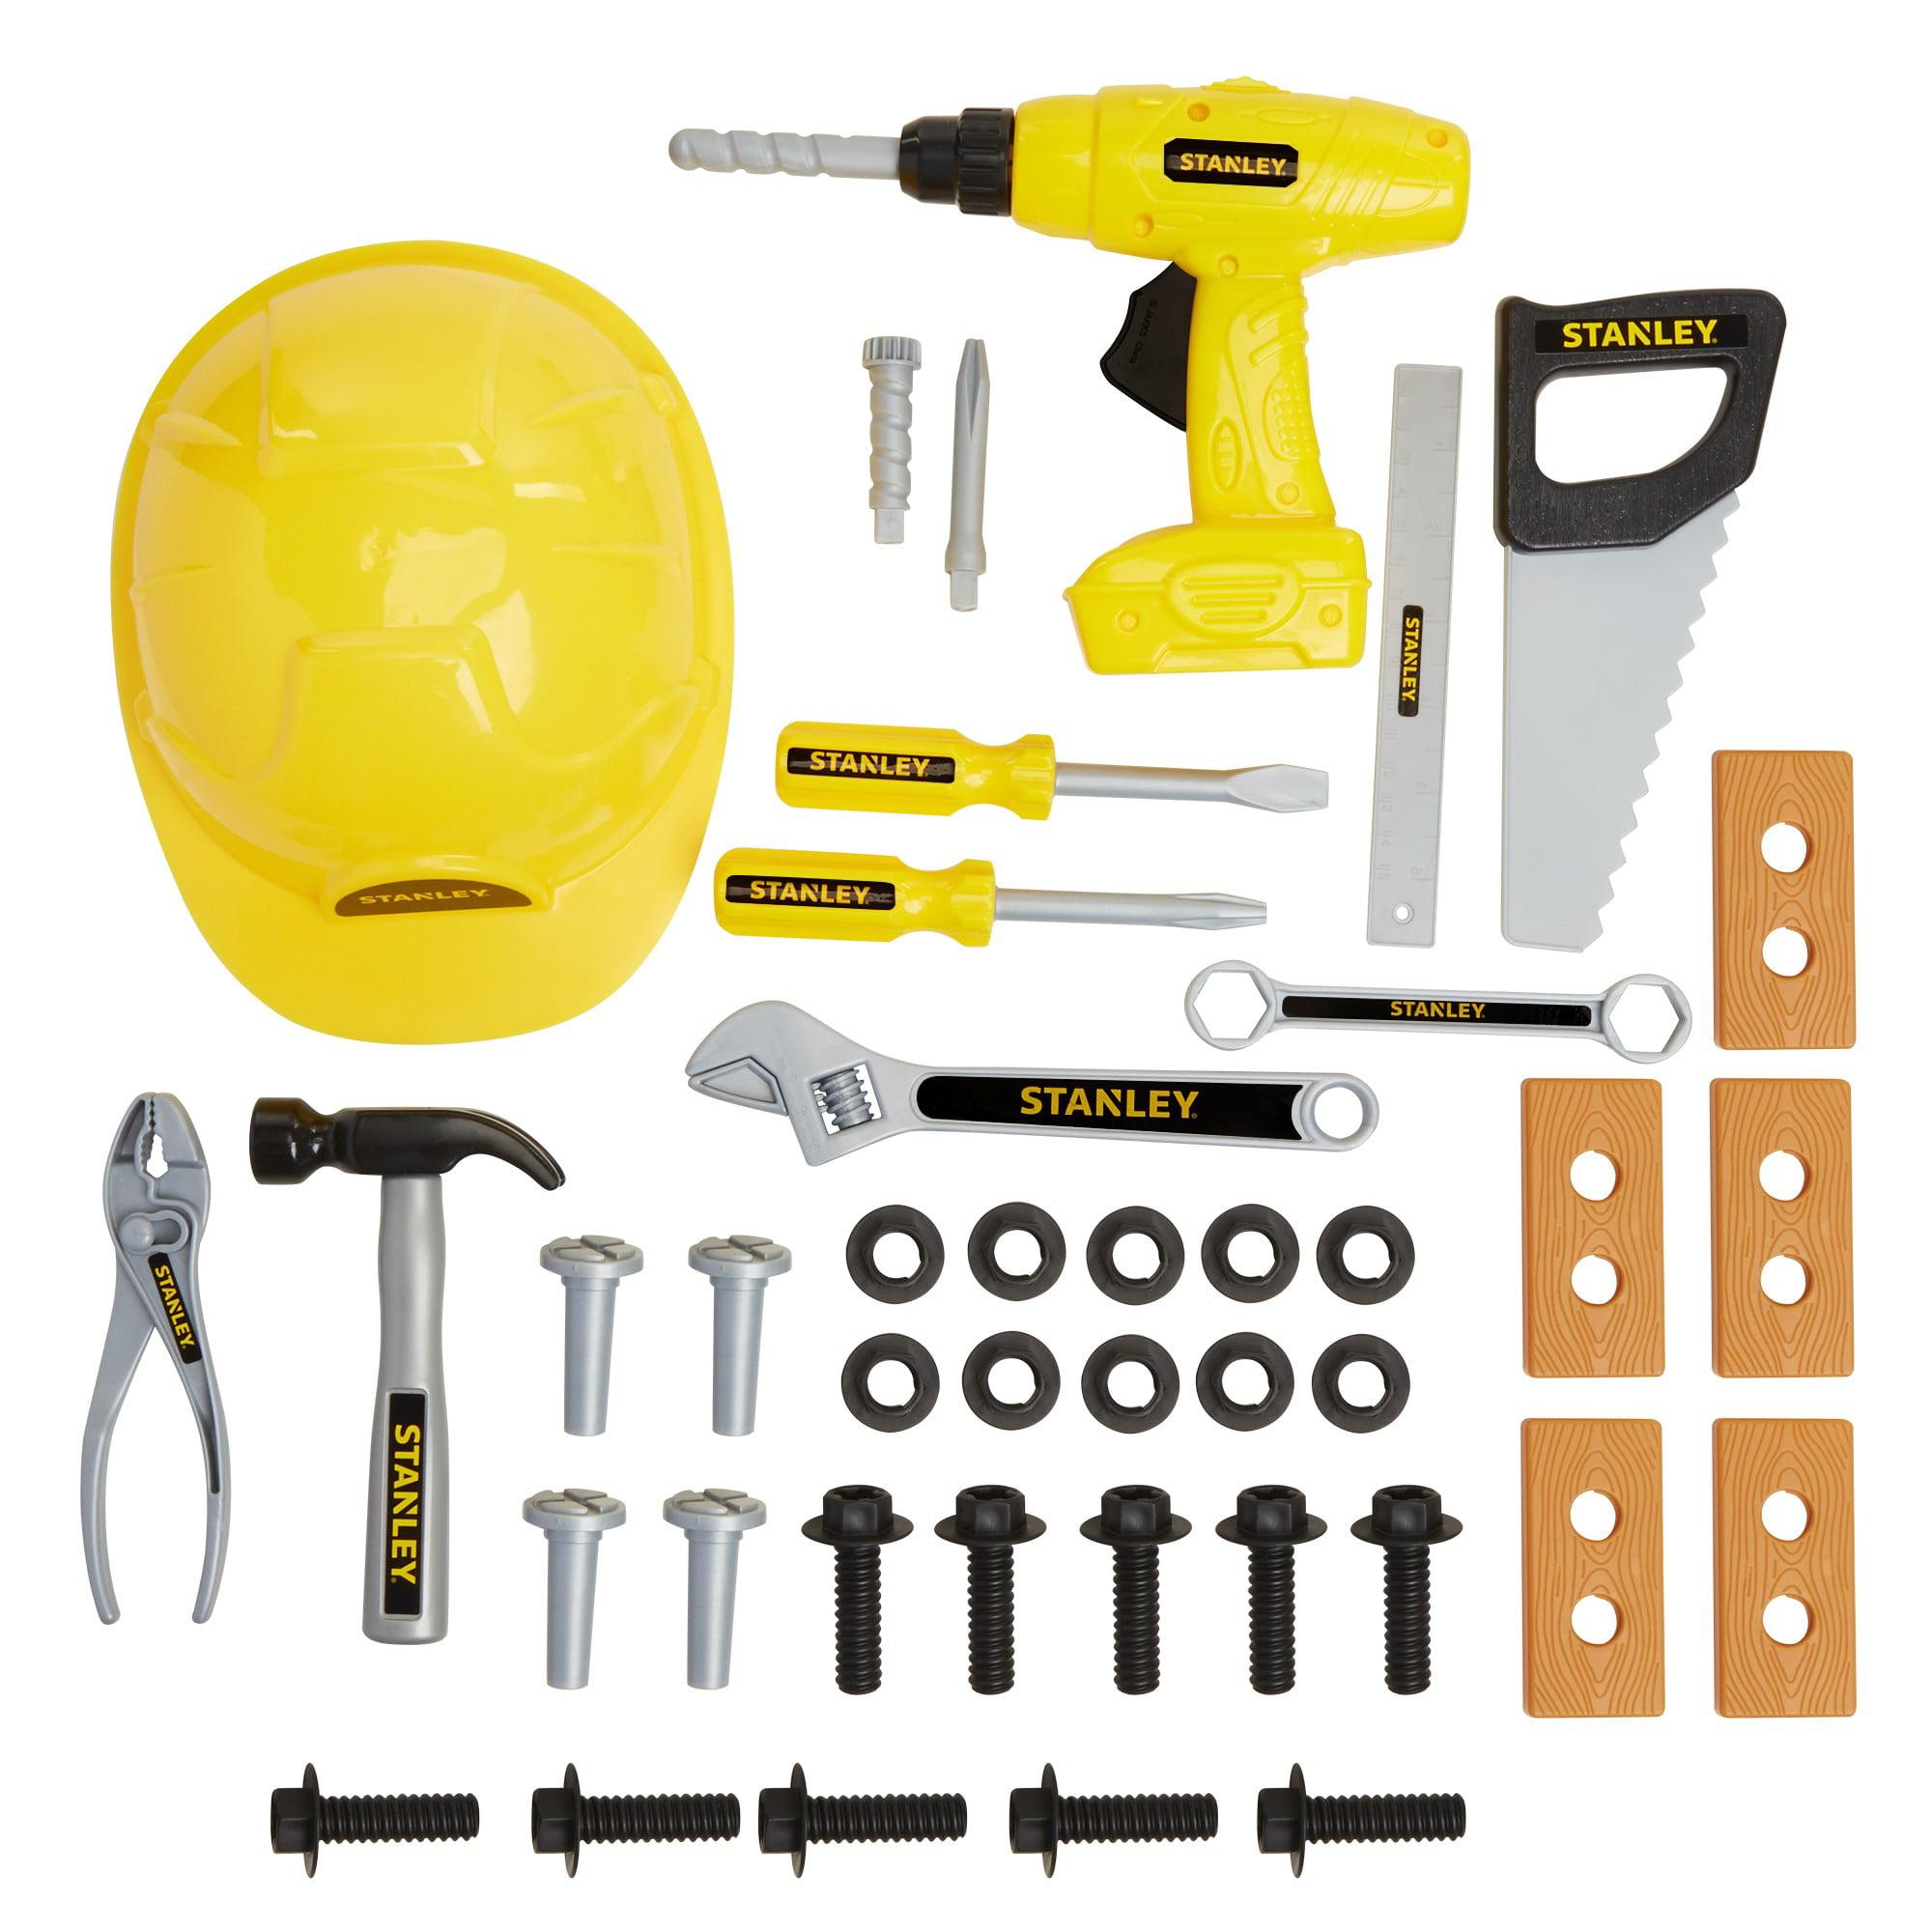 Stanley Jr. Mega Tool Set